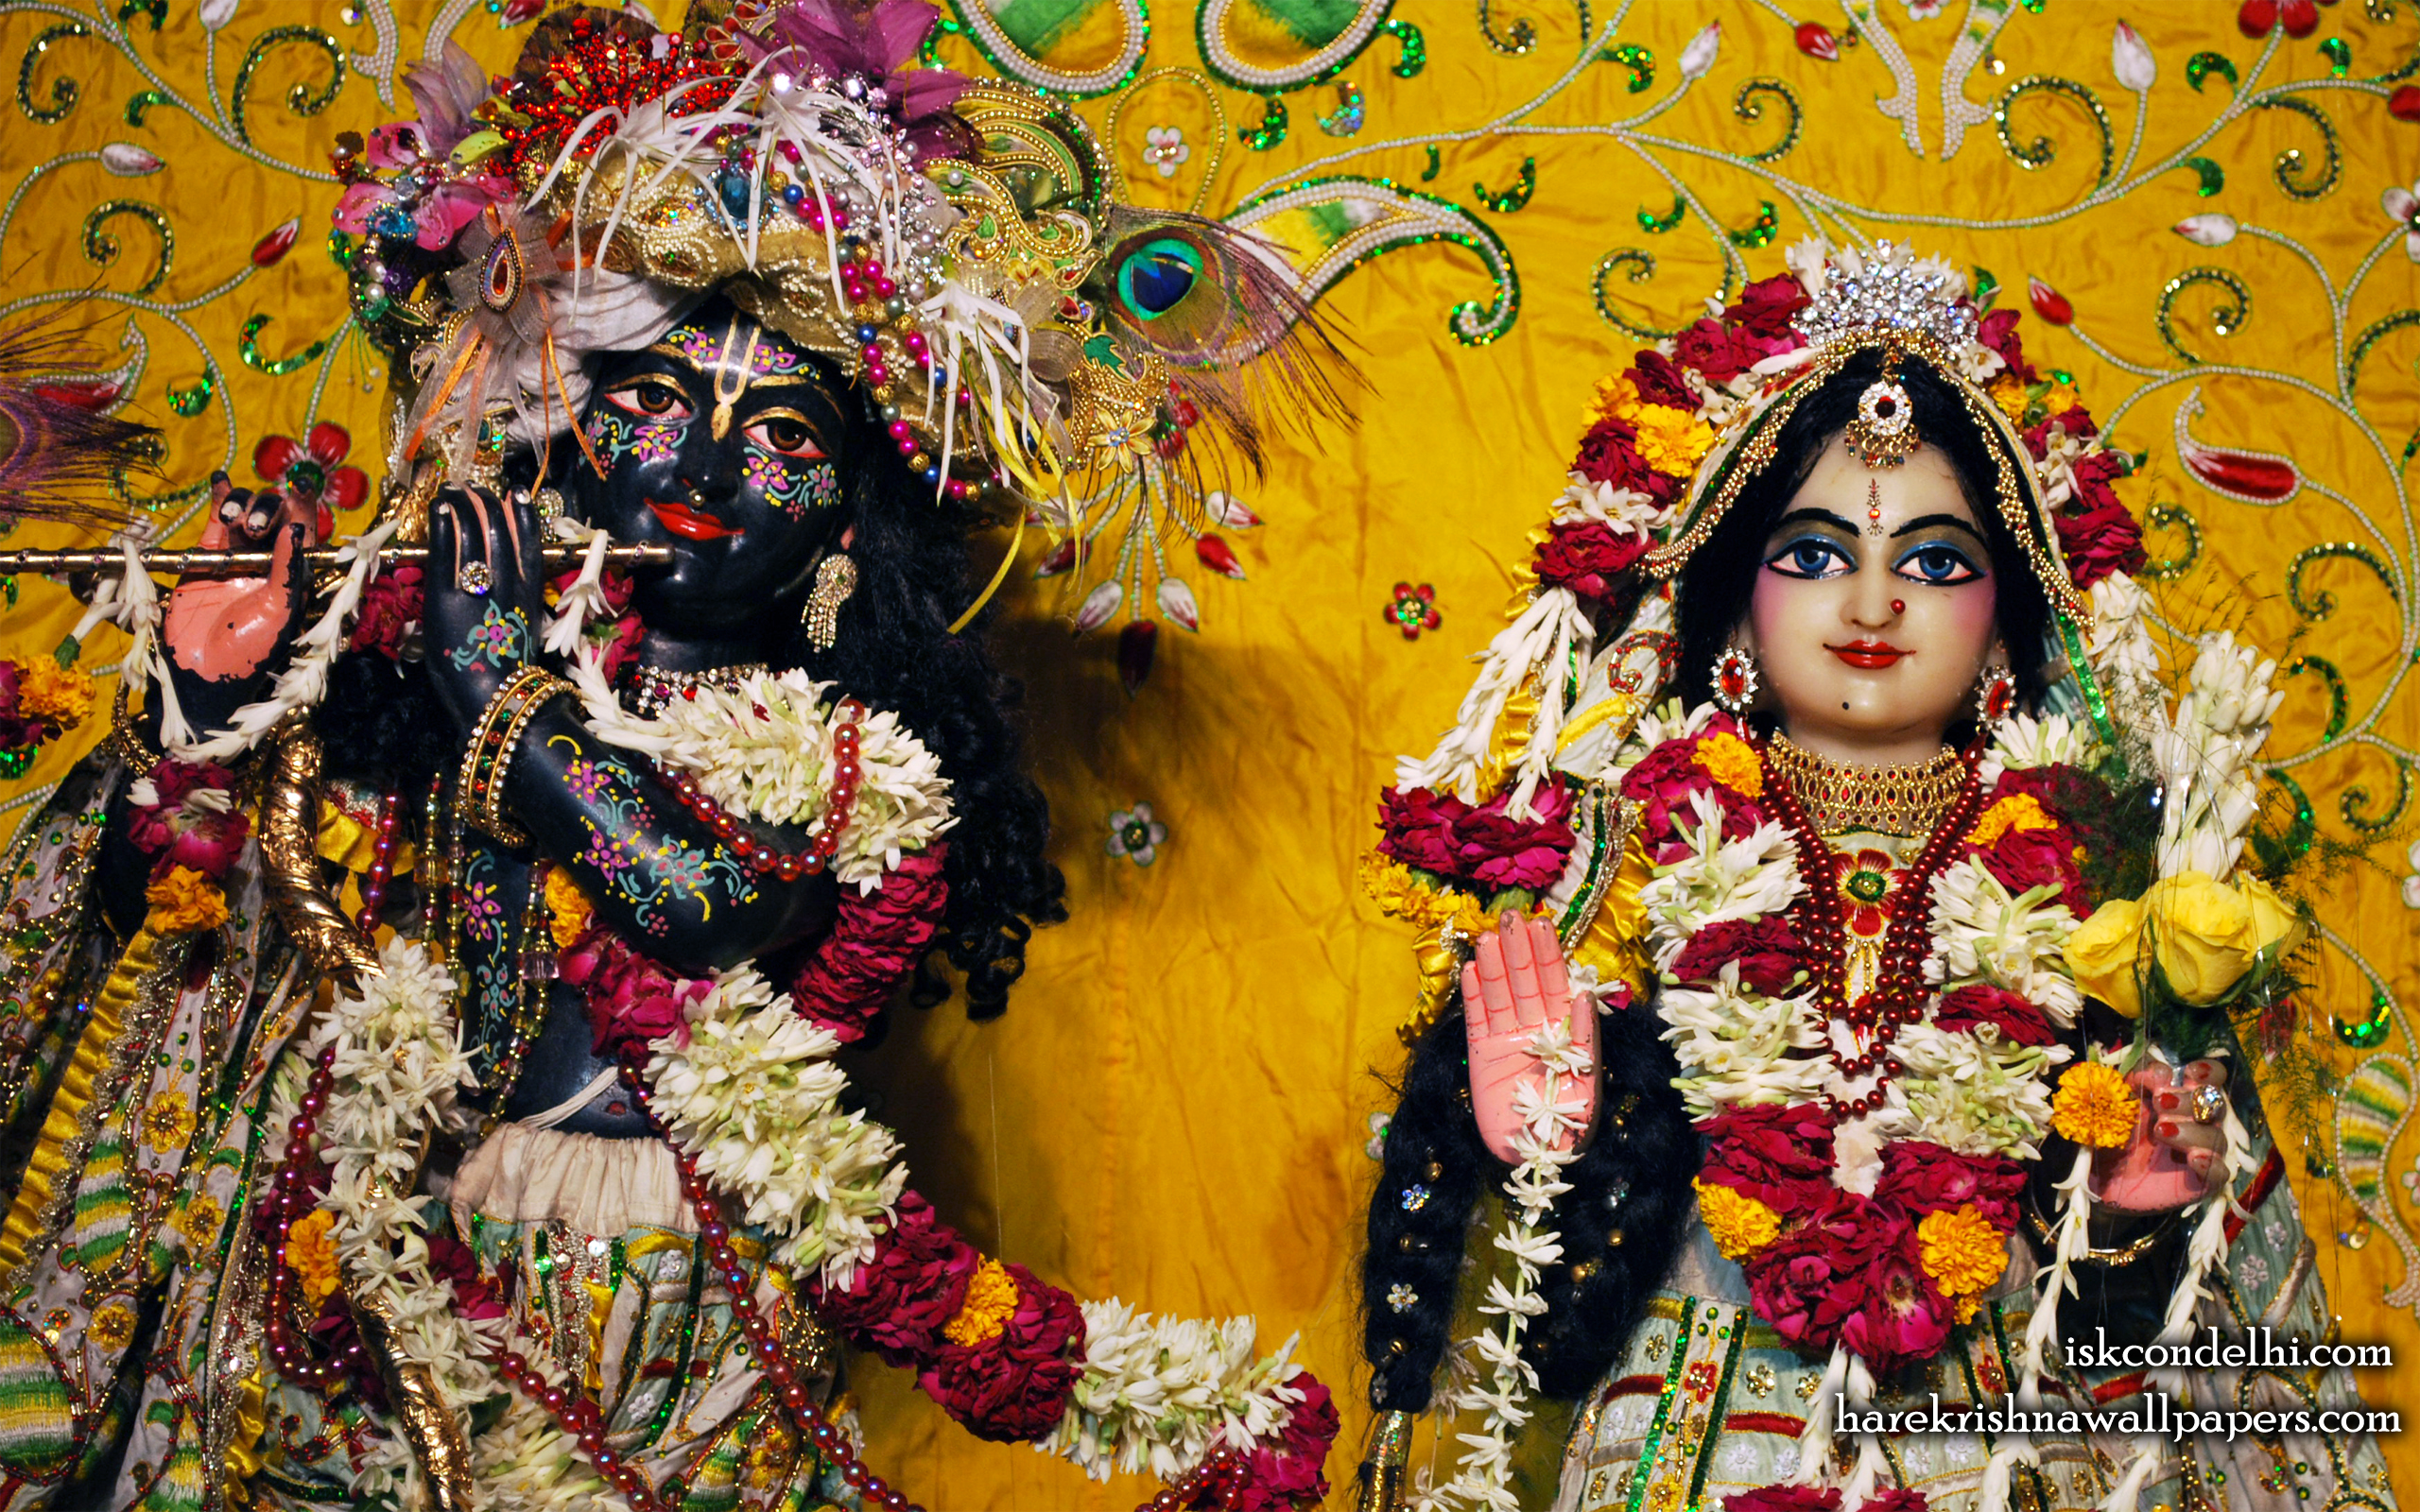 Sri Sri Radha Parthasarathi Close up Wallpaper (010) Size 2560x1600 Download